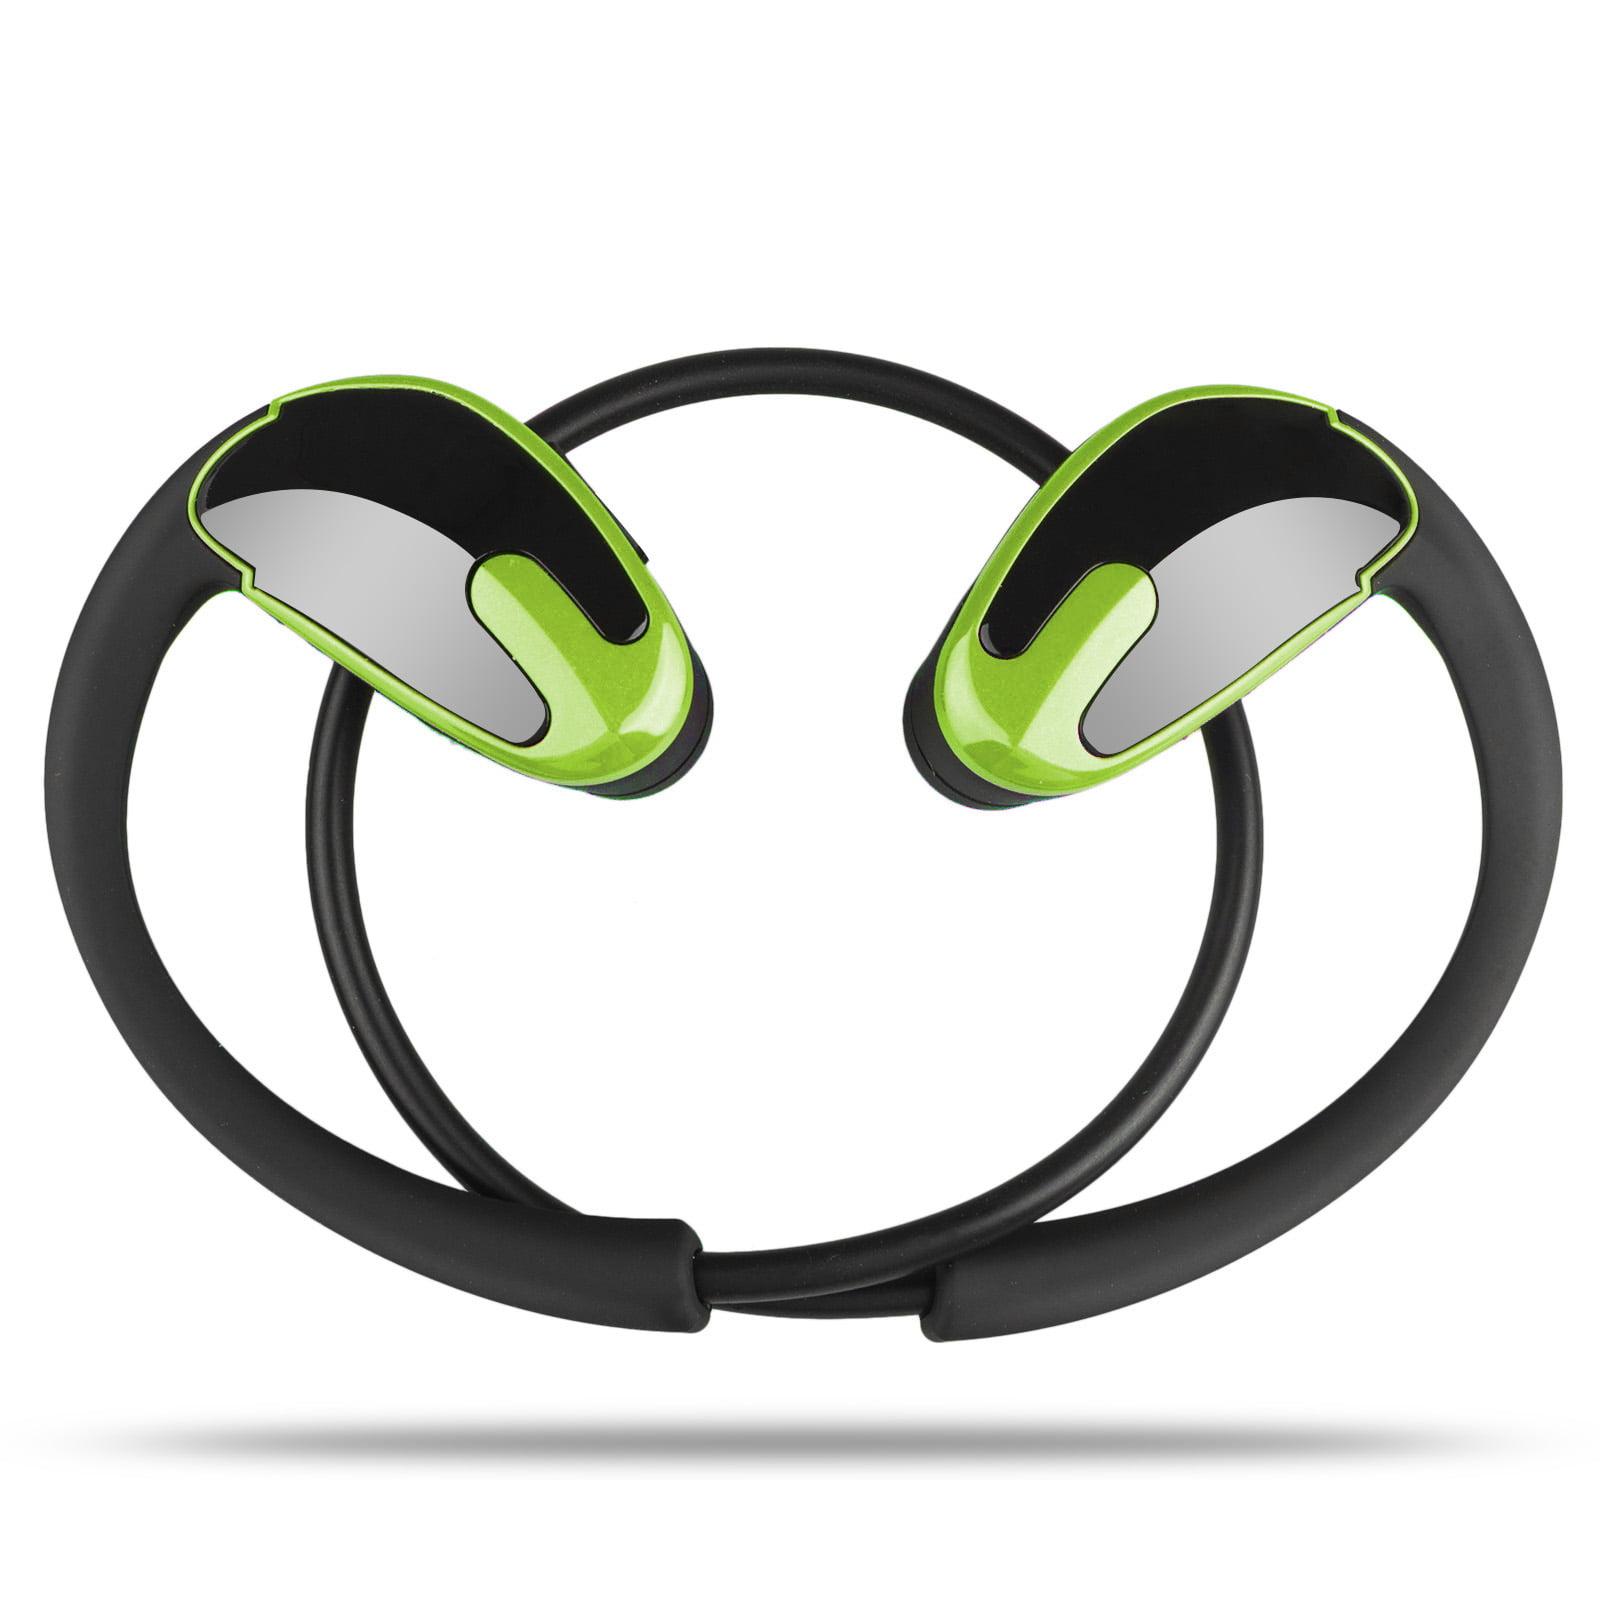 Bluetooth 4.1 Headset, Mini Wireless Headphone Earbud, Smallest In-ear Earphone w/Mic for Hands-Free Calling Long Time Using